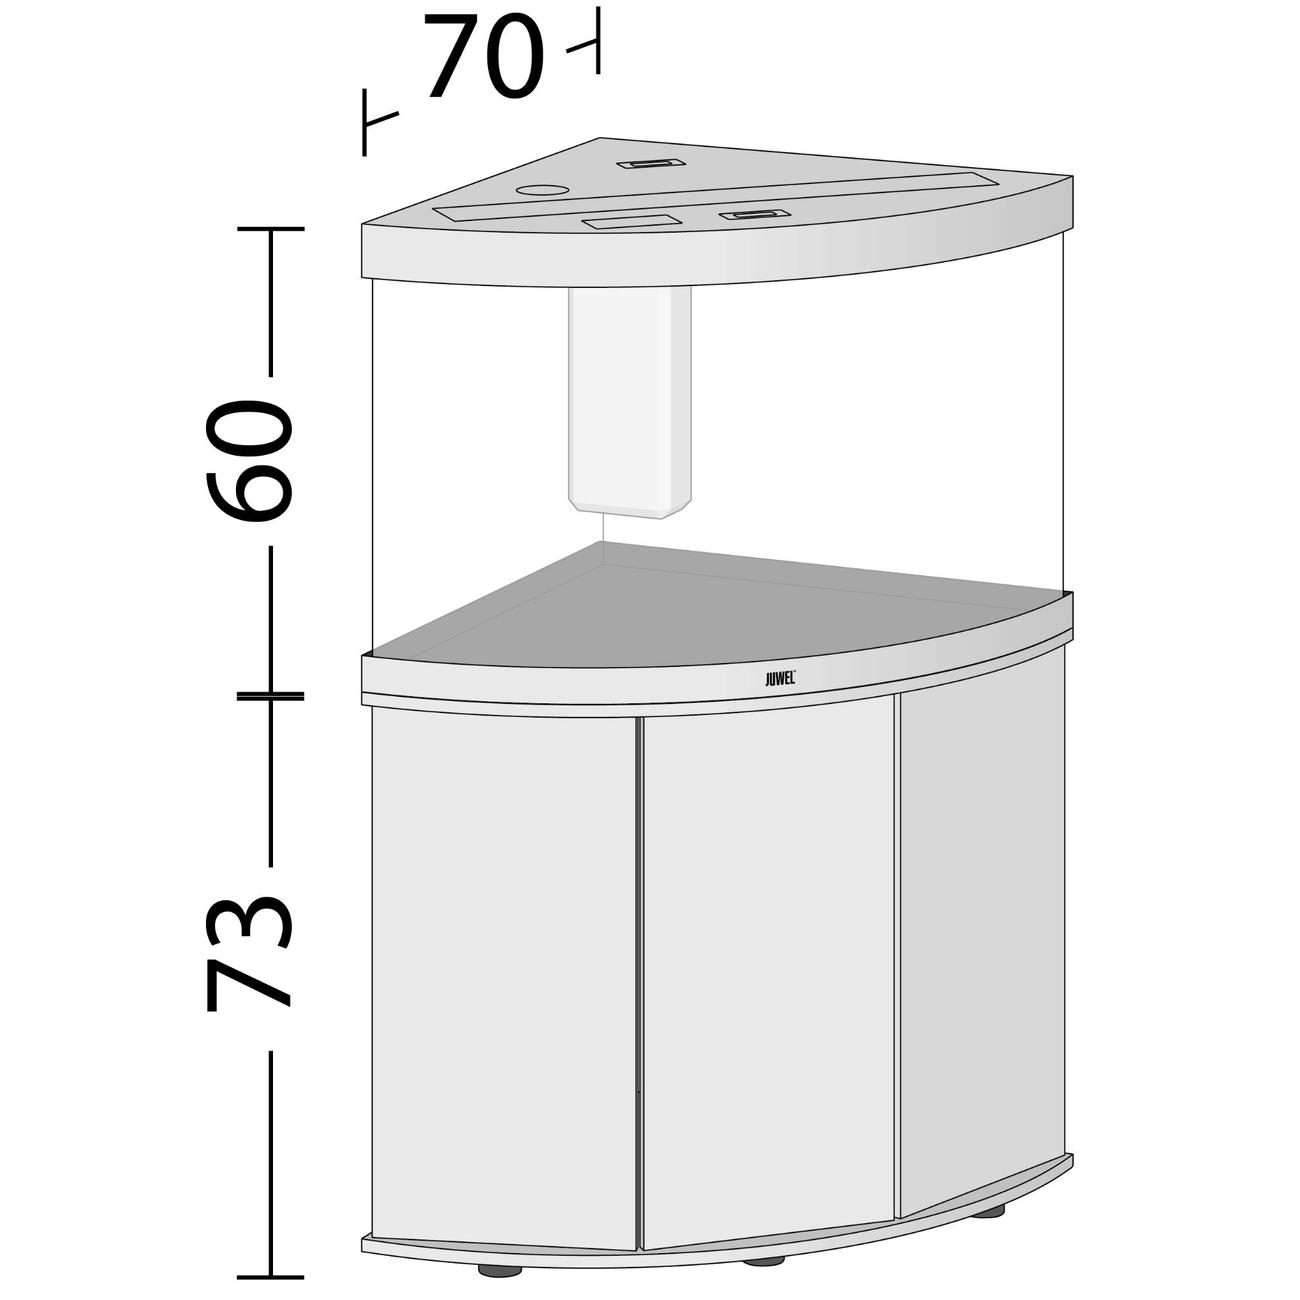 Juwel Trigon 190 LED Eck-Aquarium mit Unterschrank, Bild 5